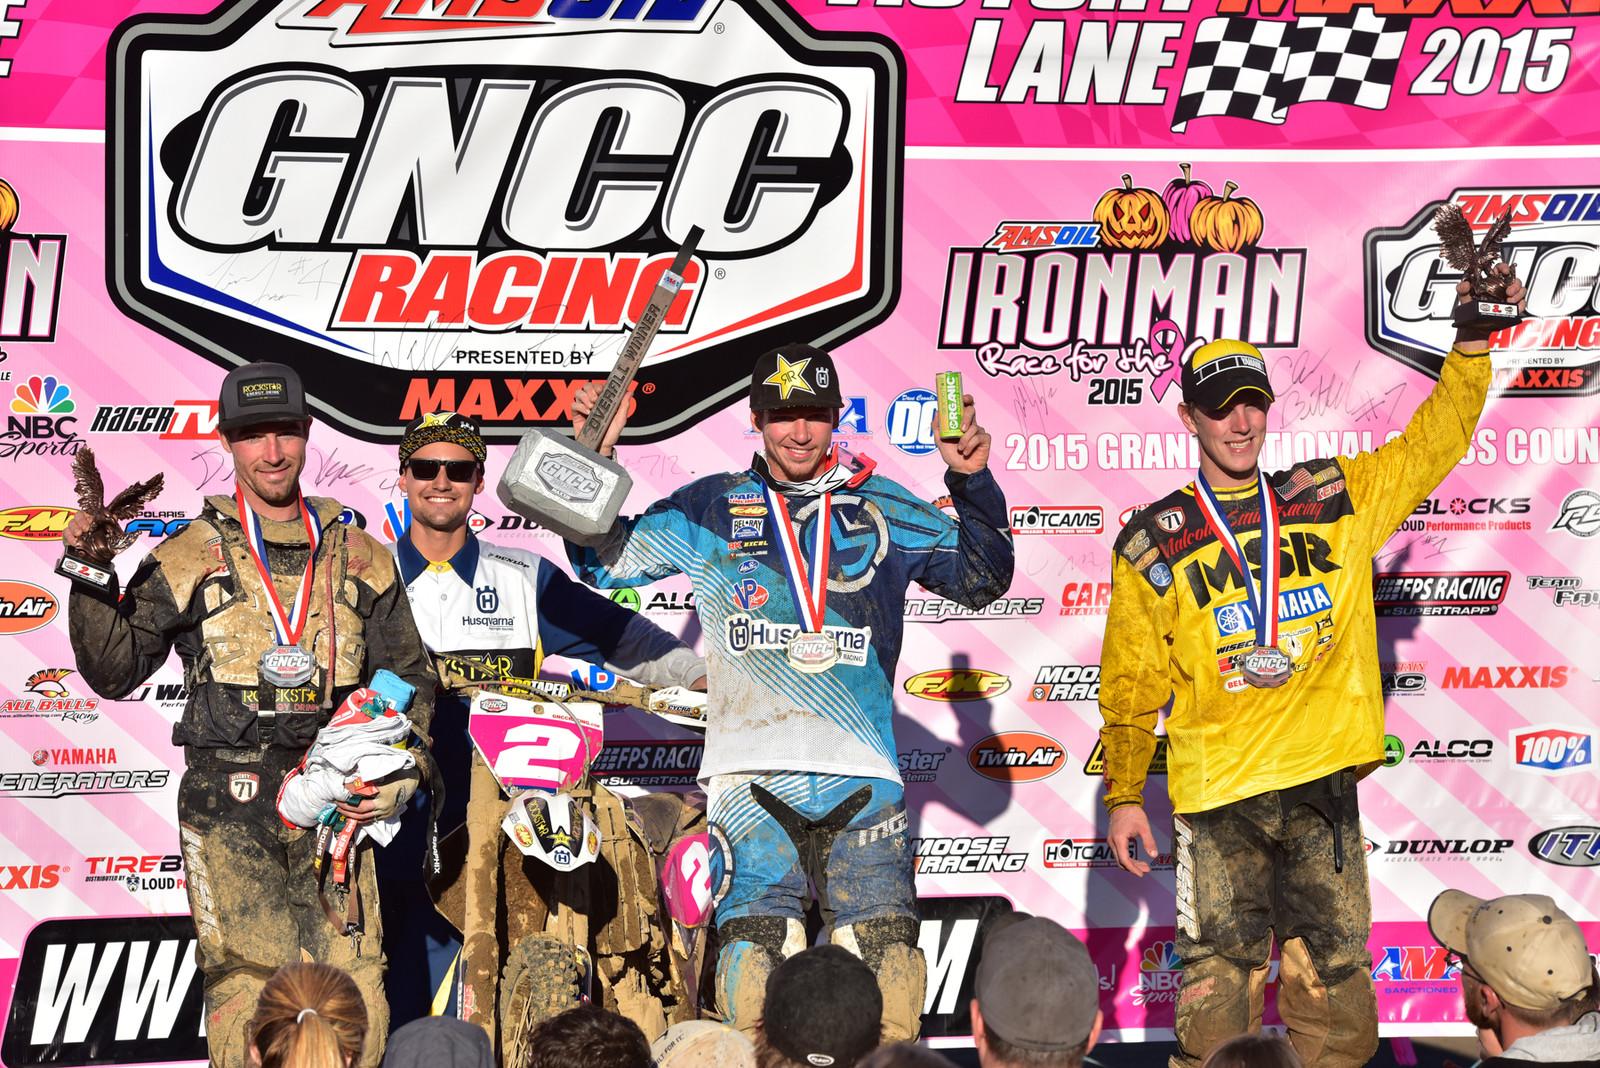 Josh Strang, Ryan Sipes, and Jordan Ashburn - Photo Blast: Ironman GNCC - Motocross Pictures - Vital MX